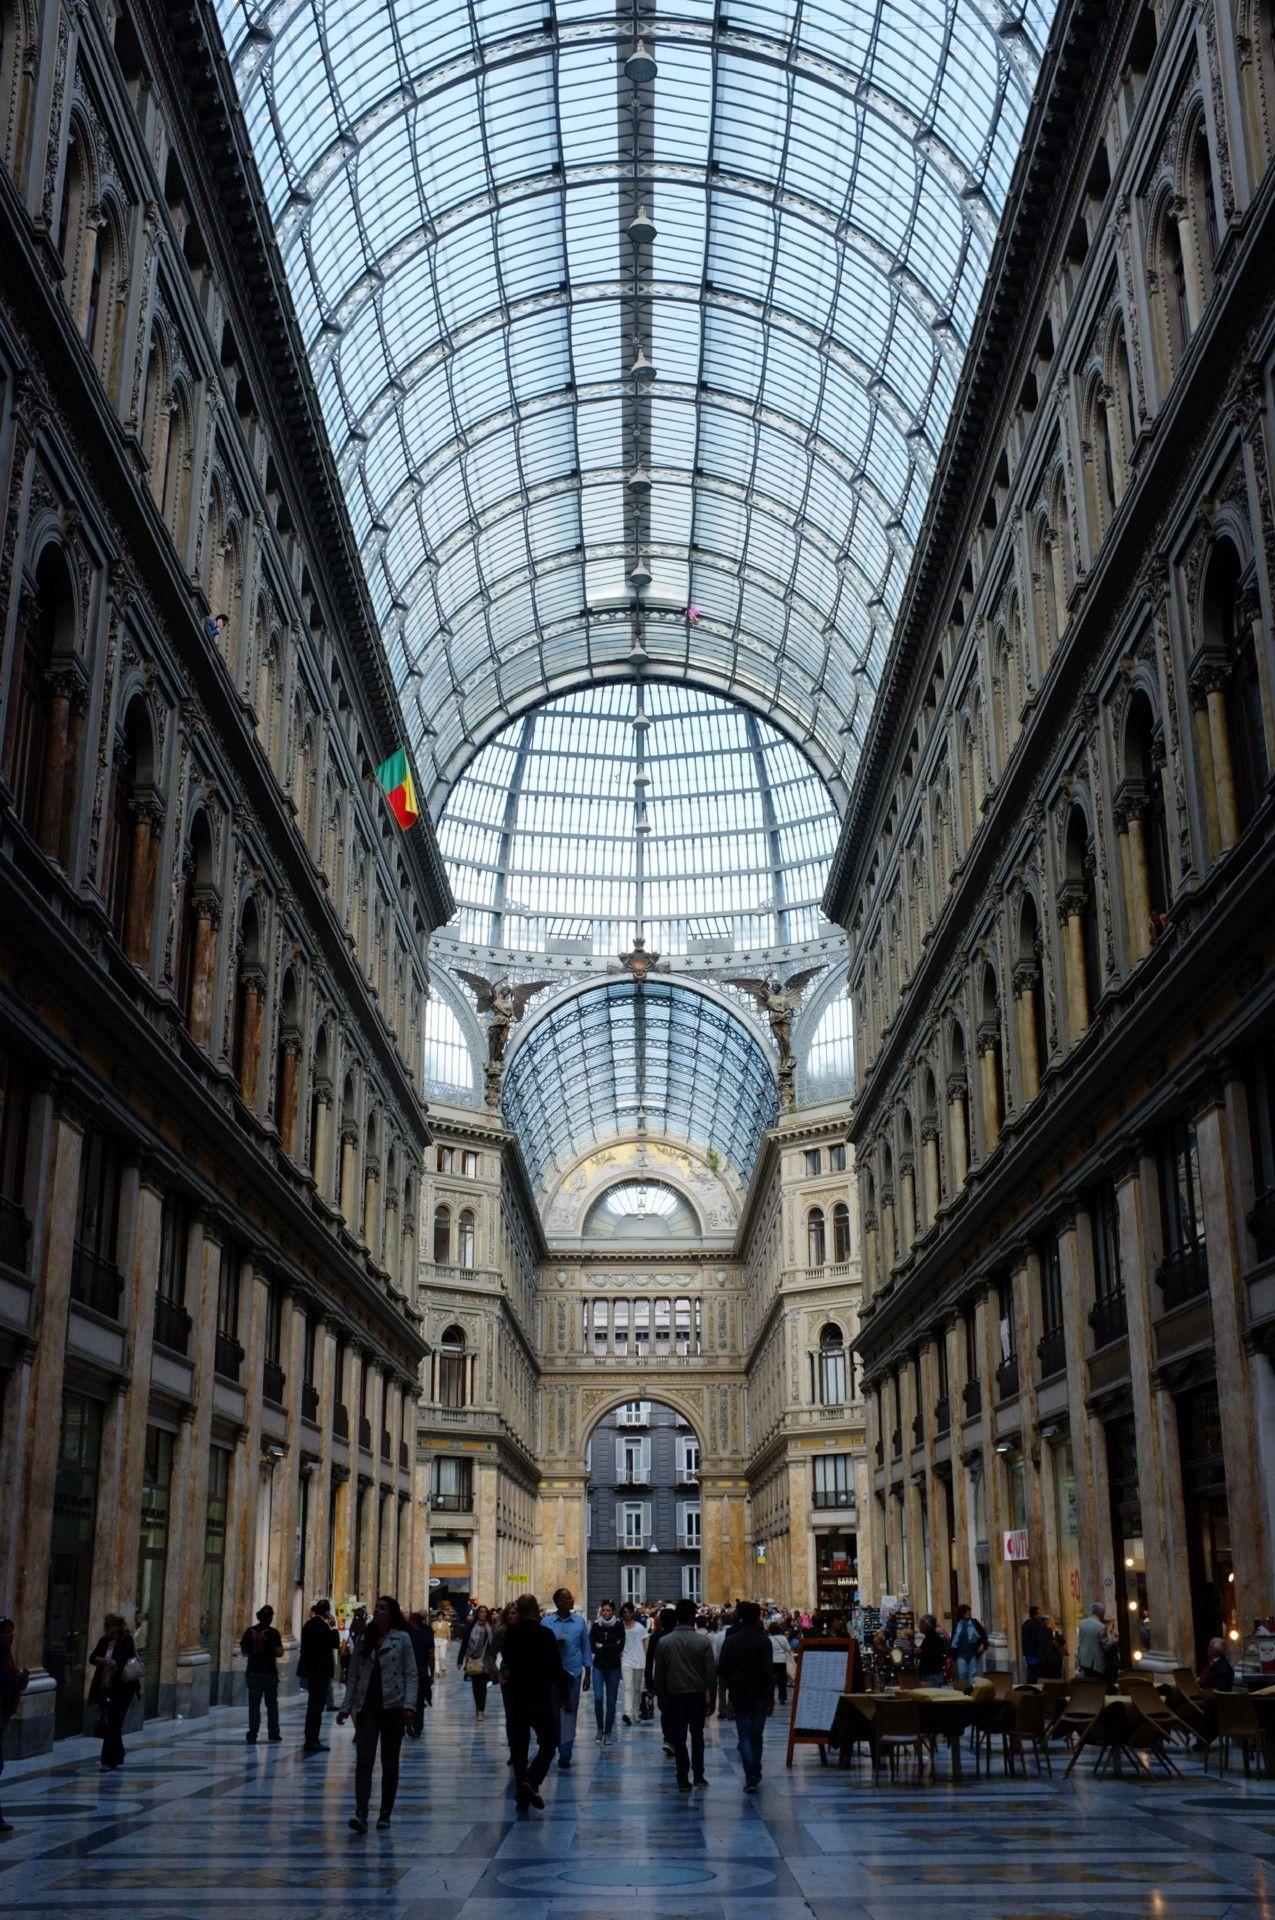 Galleria Umberto I. Naples, May 2012.